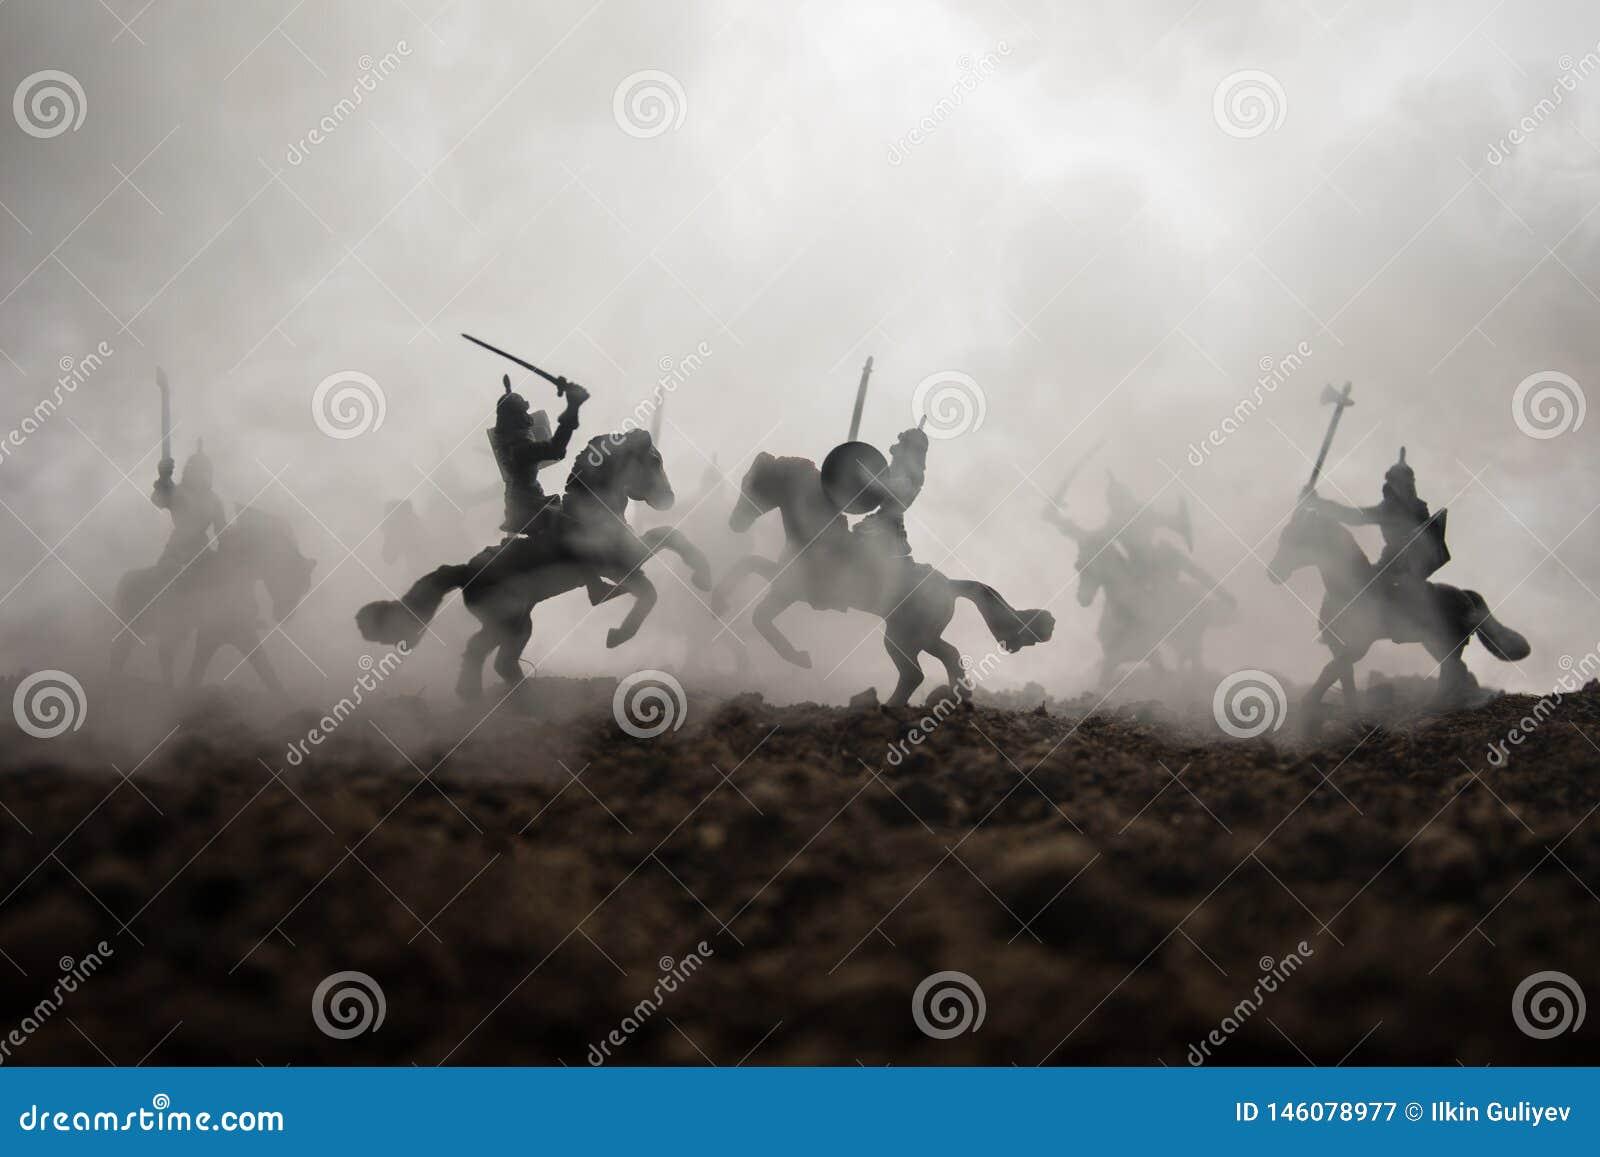 Medeltida stridplats med kavalleri och infanteri Konturer av diagram som separata objekt, kamp mellan krigare p? solnedg?ng